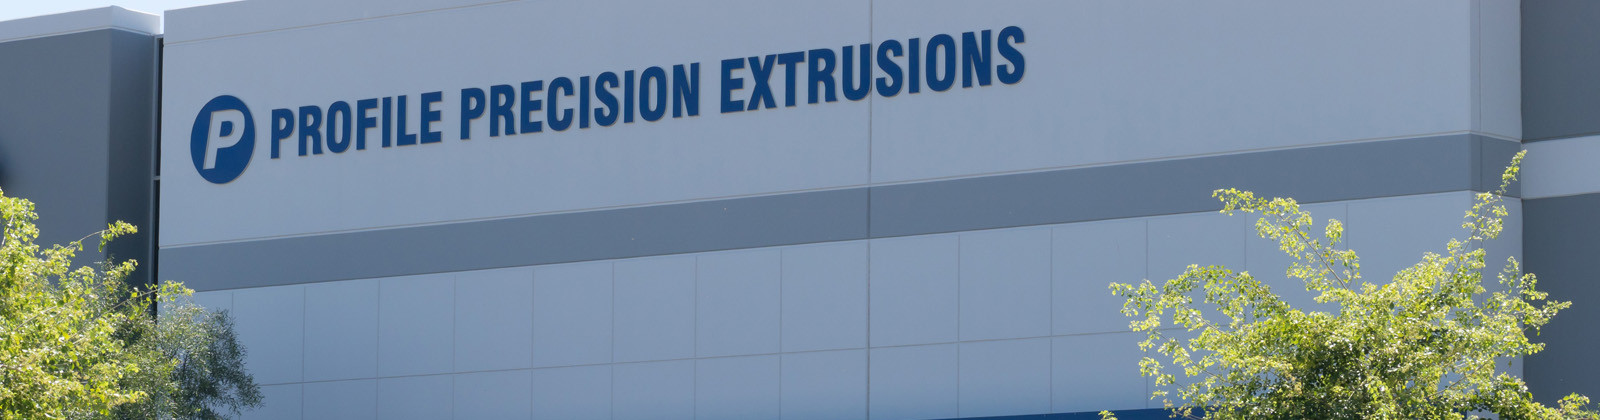 Profile Precision Extrusions Building